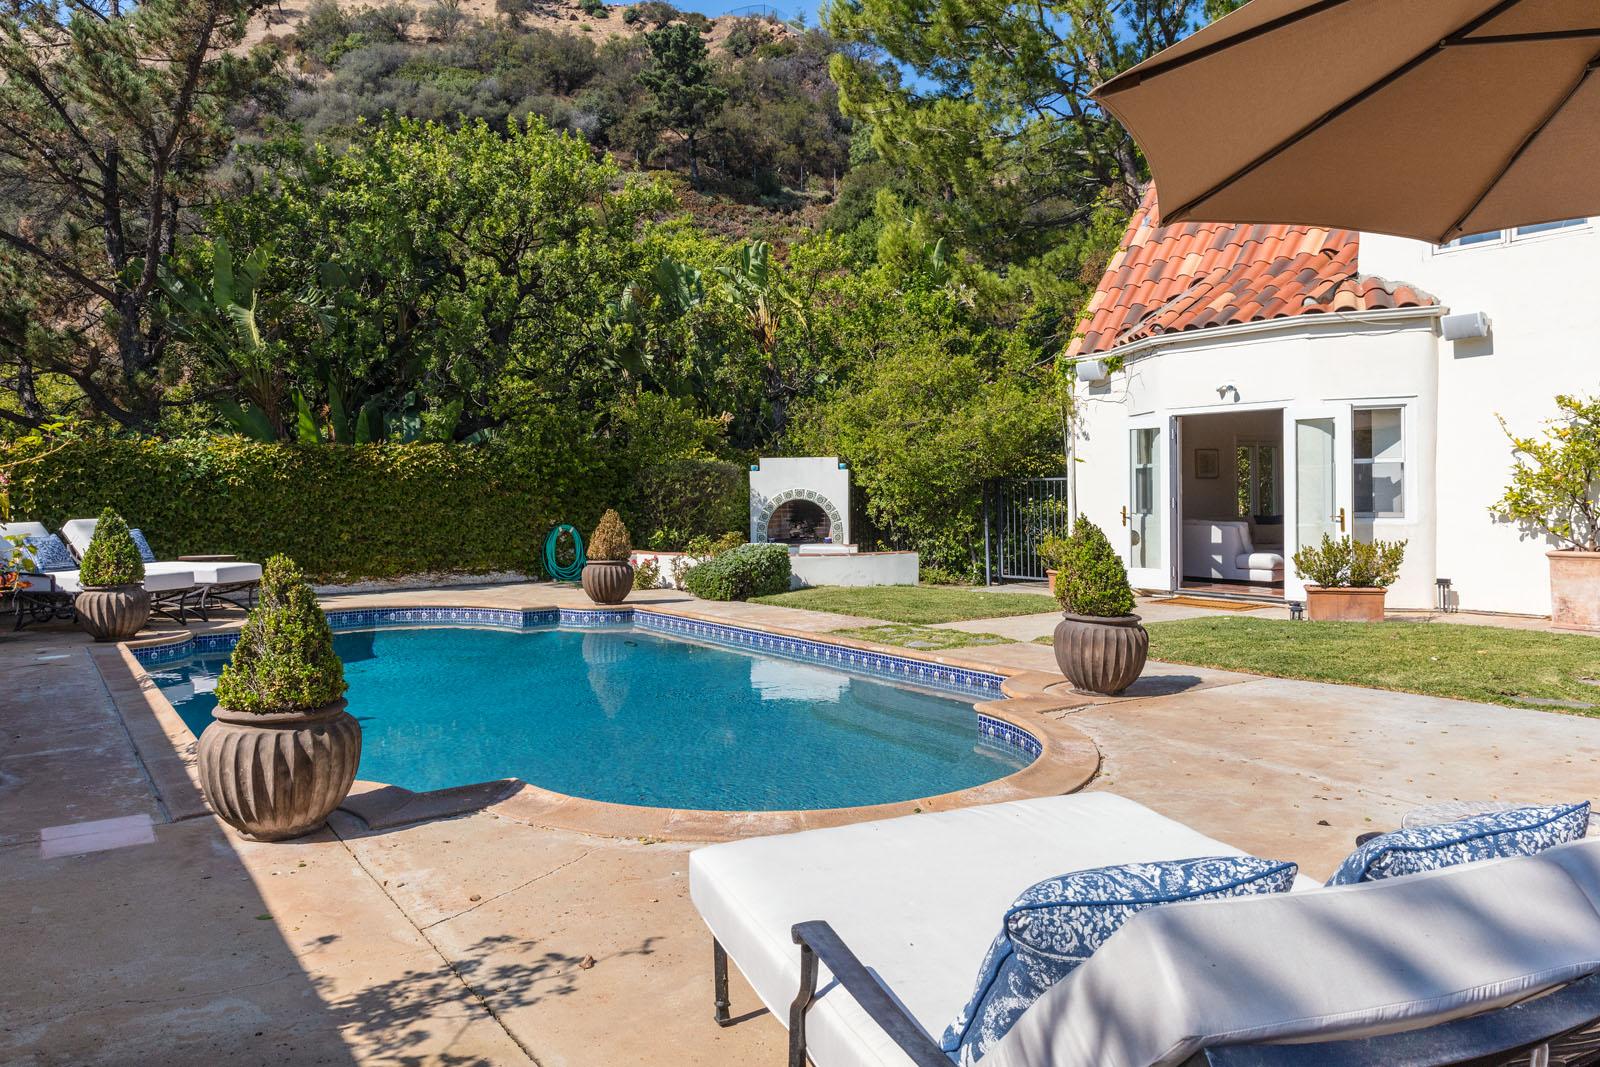 015 Pool 1712 Manzanita Park Avenue Malibu For Sale Lease The Malibu Life Team Luxury Real Estate.jpg